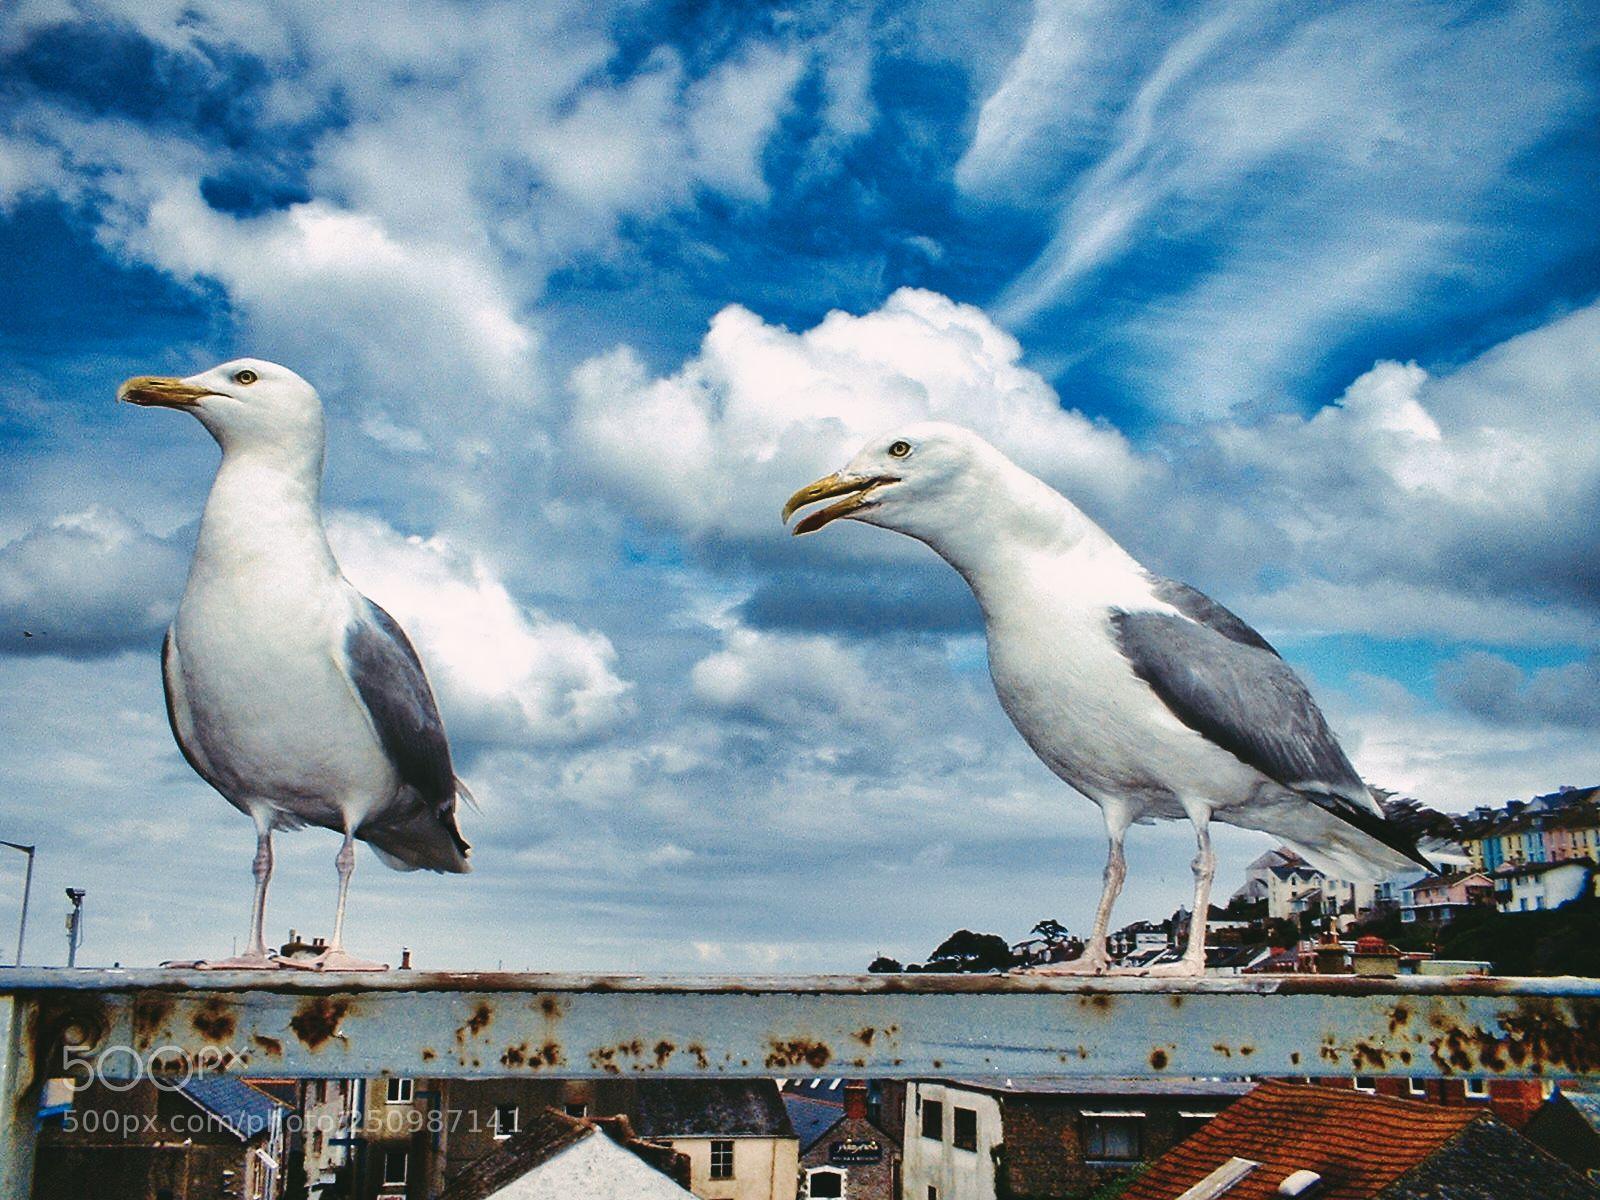 "Fujifilm FinePix A202 sample photo. ""Seagulls of brixham"" photography"